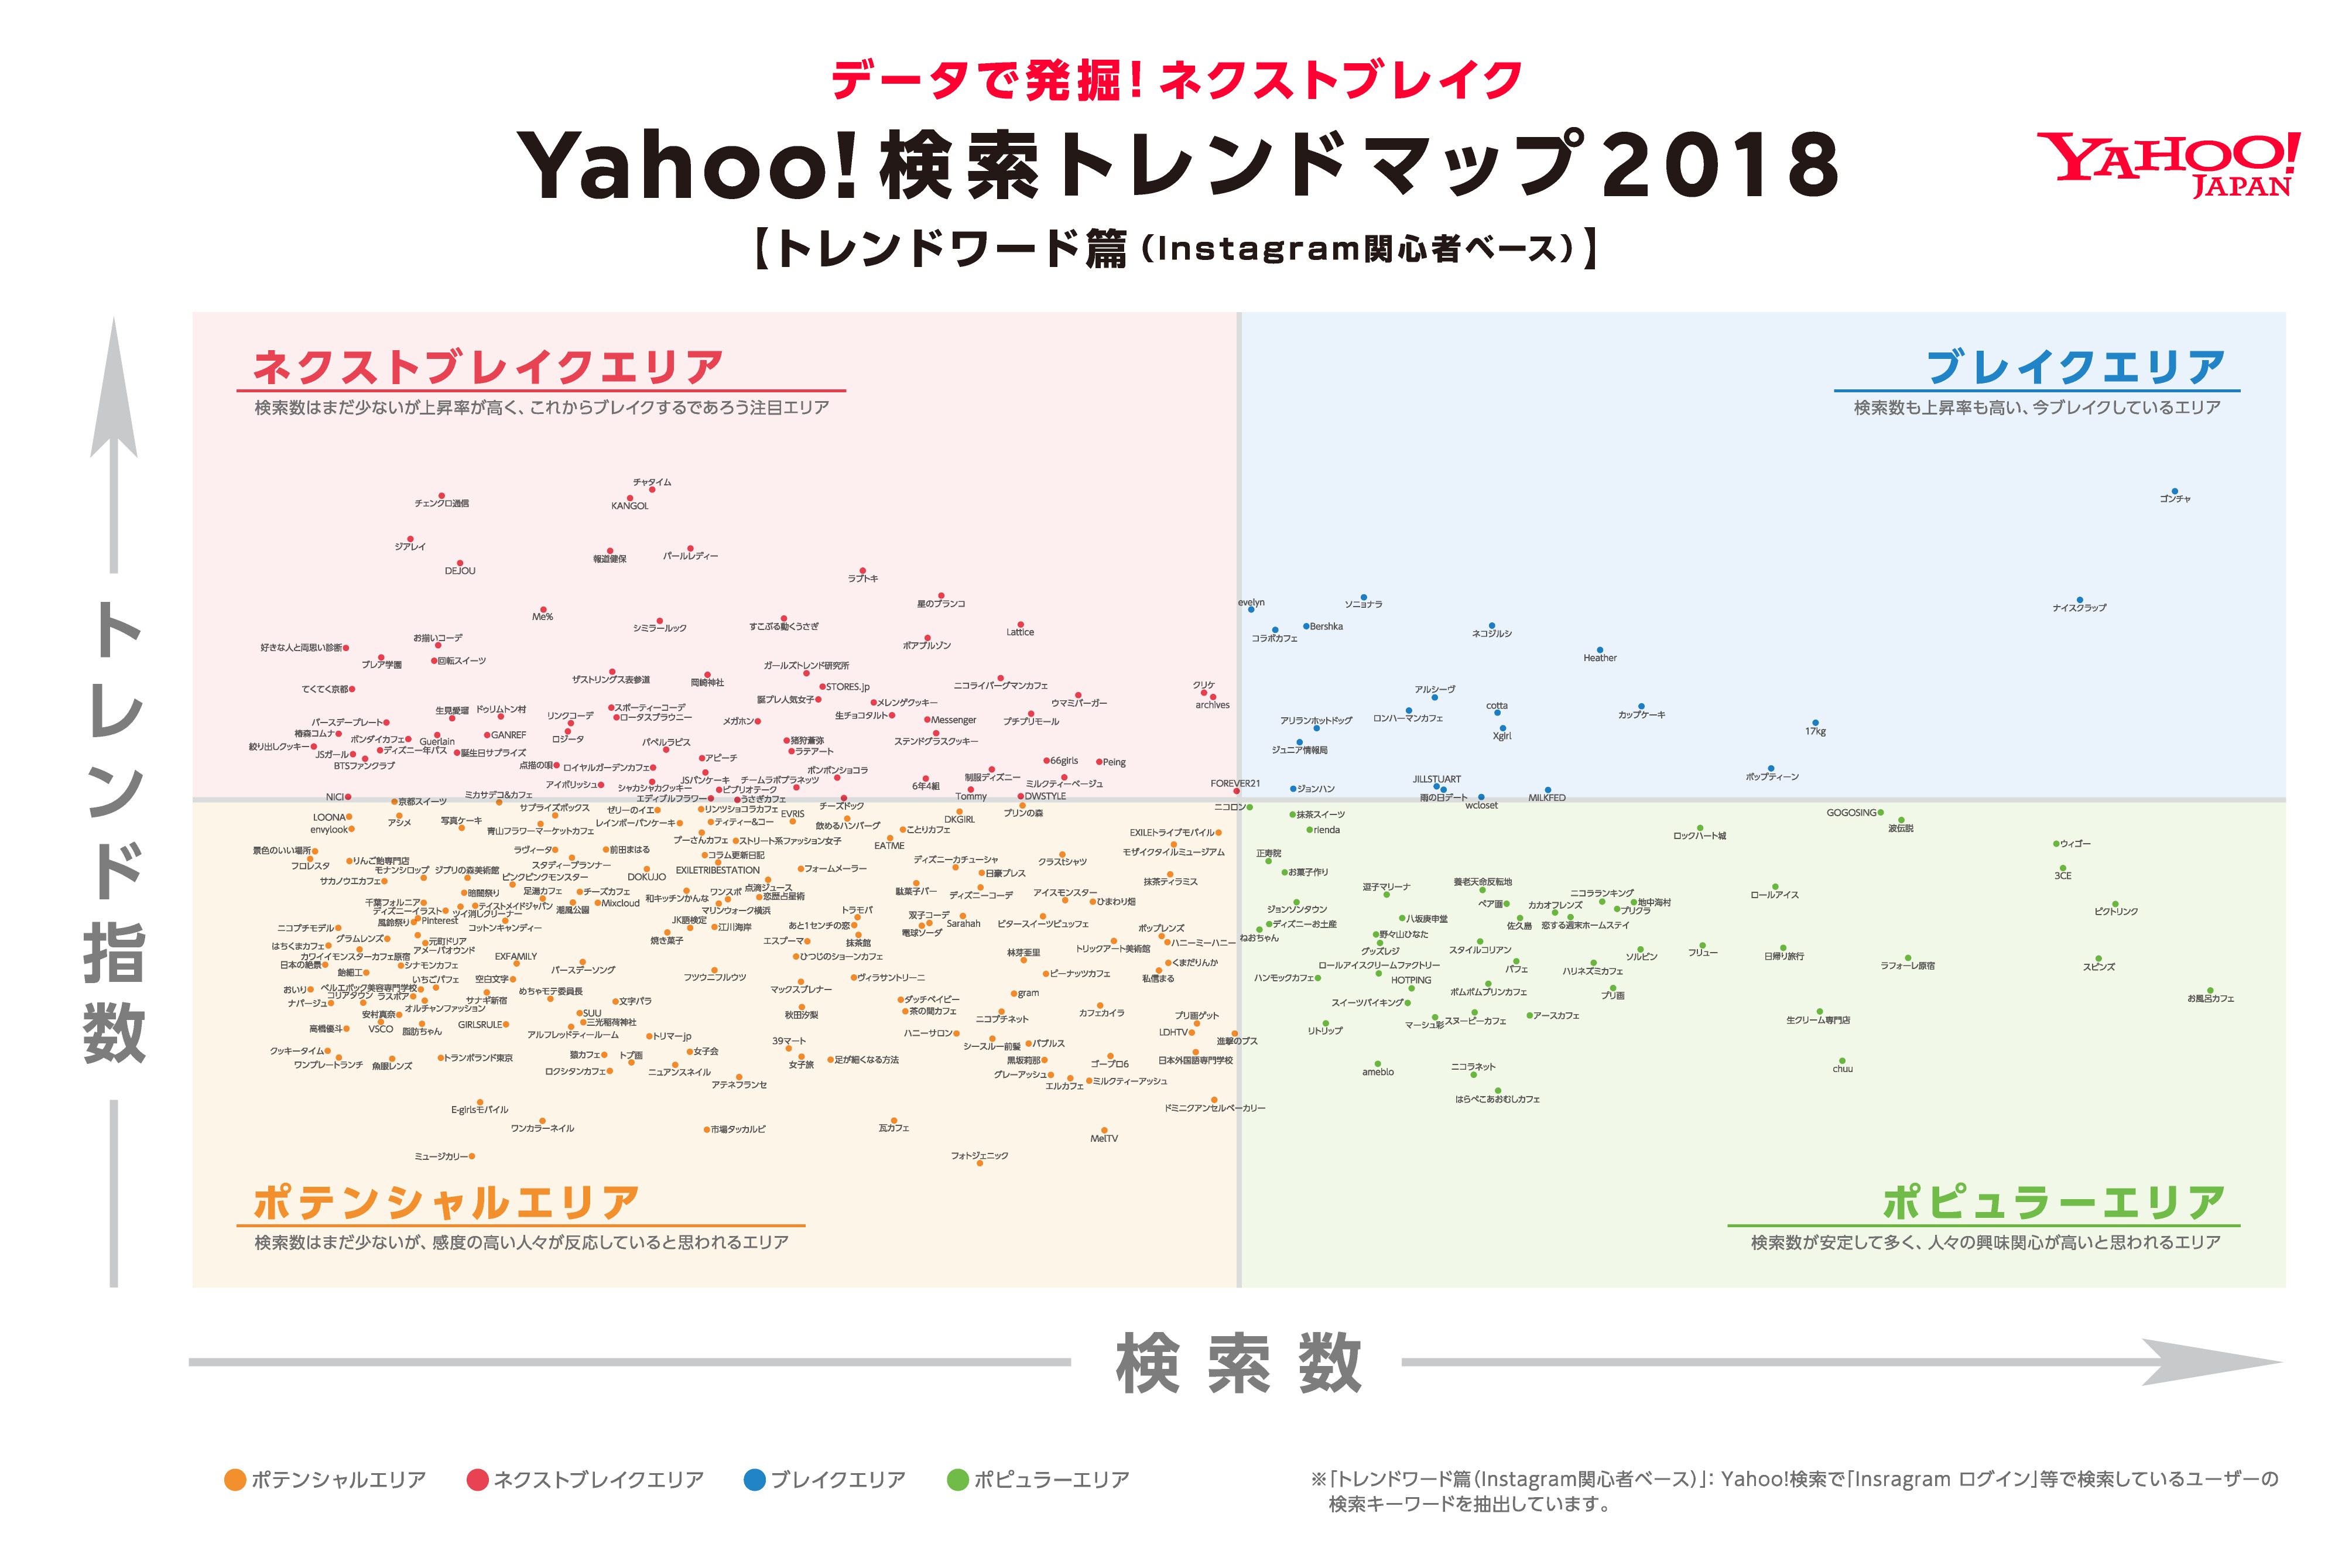 Yahoo!検索トレンドマップ2018 トレンドワード篇(Instagram関心者ベース)